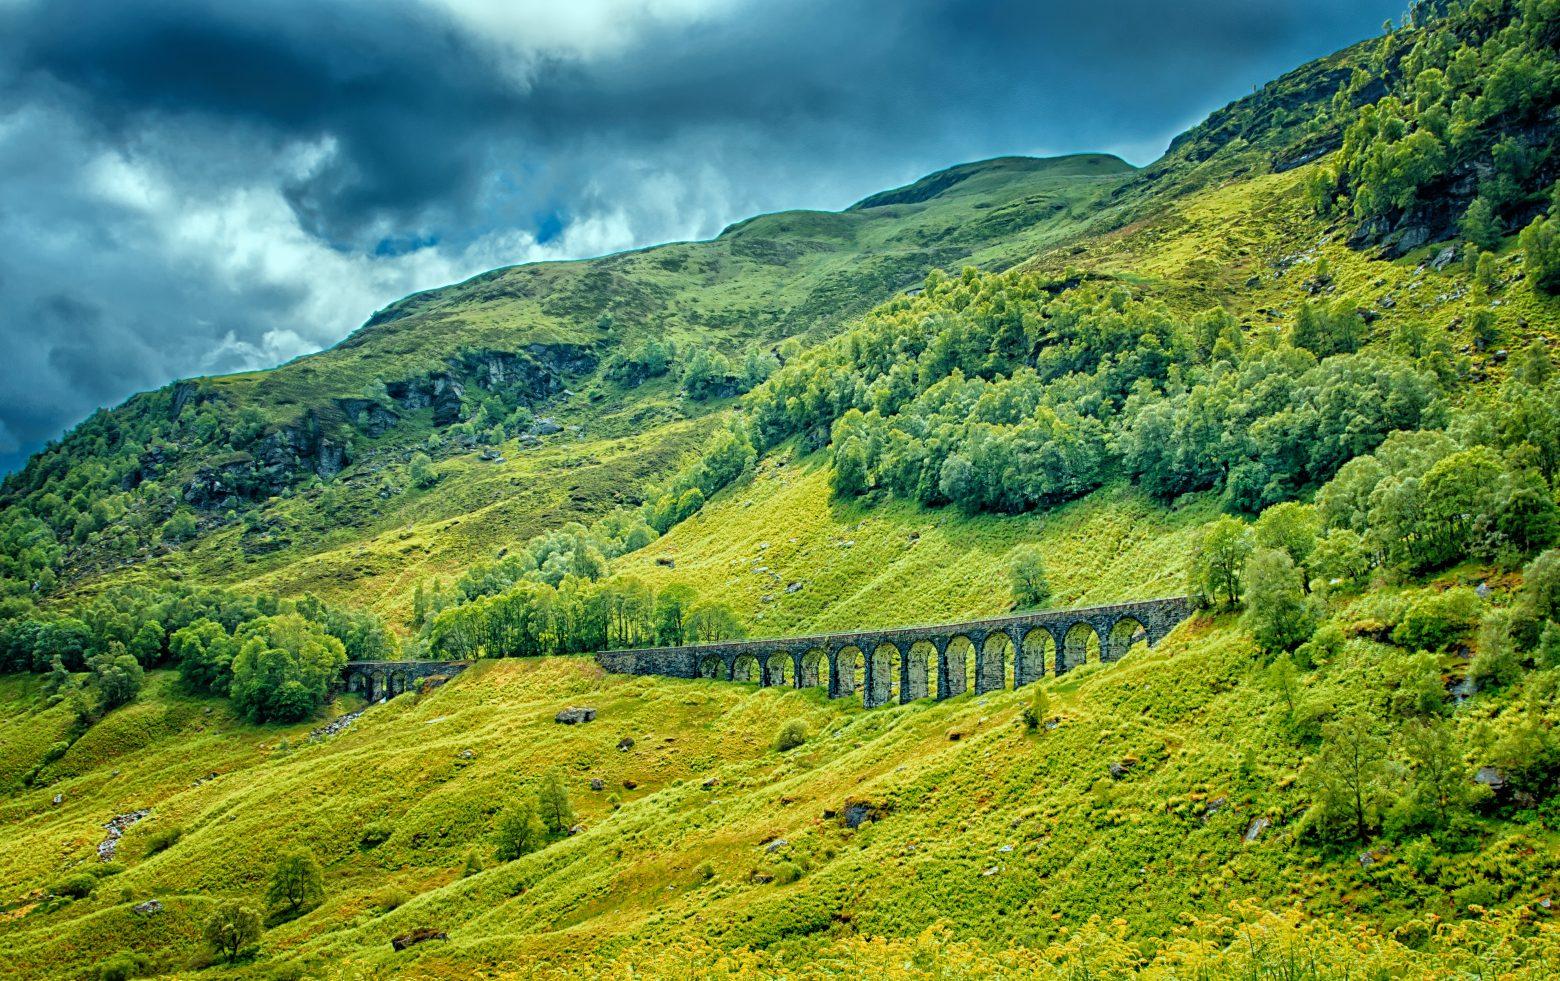 viaduct-2441340